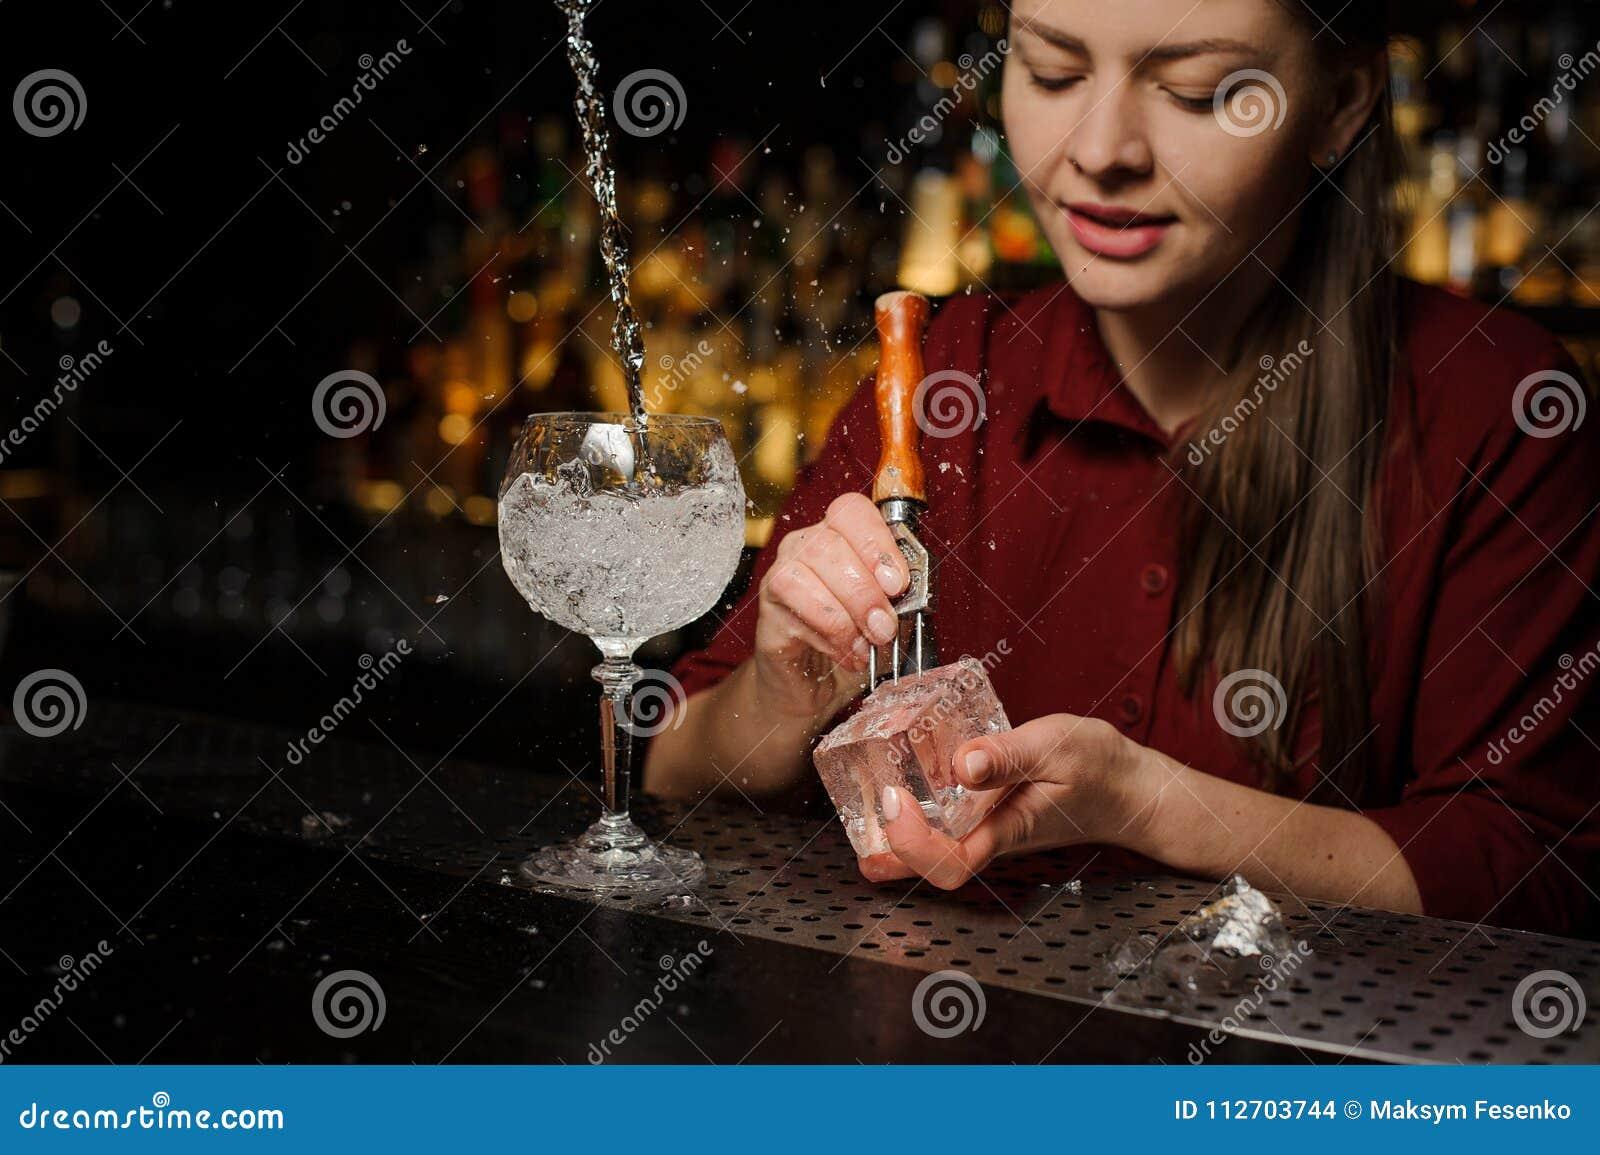 Beautiful Woman Barman Preparing An Ice Cube For Making An Aperol